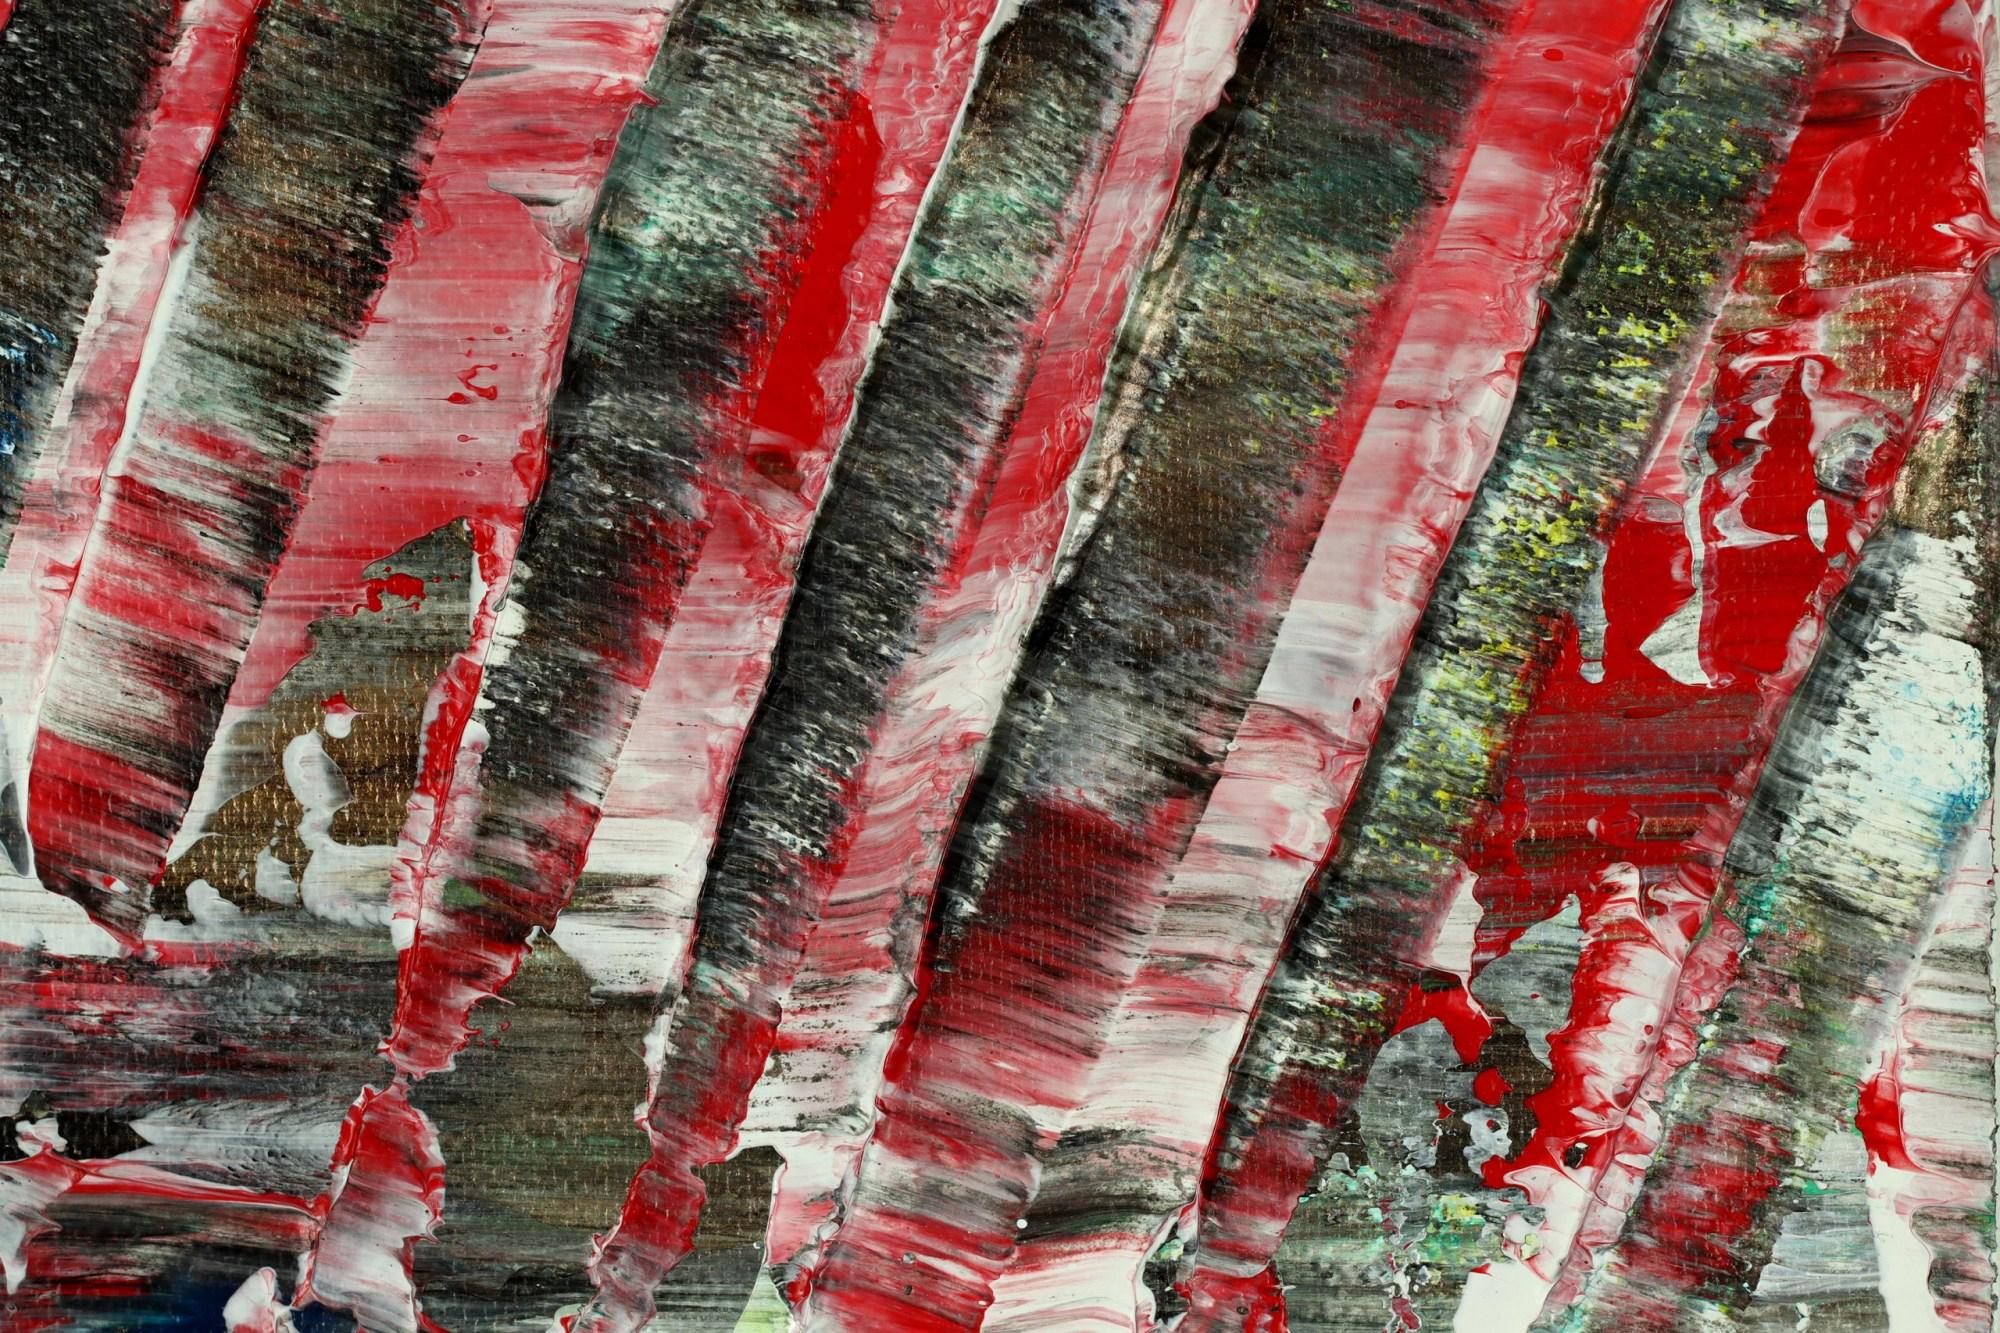 A Place With No Name (2021) / Artist: Nestor Toro